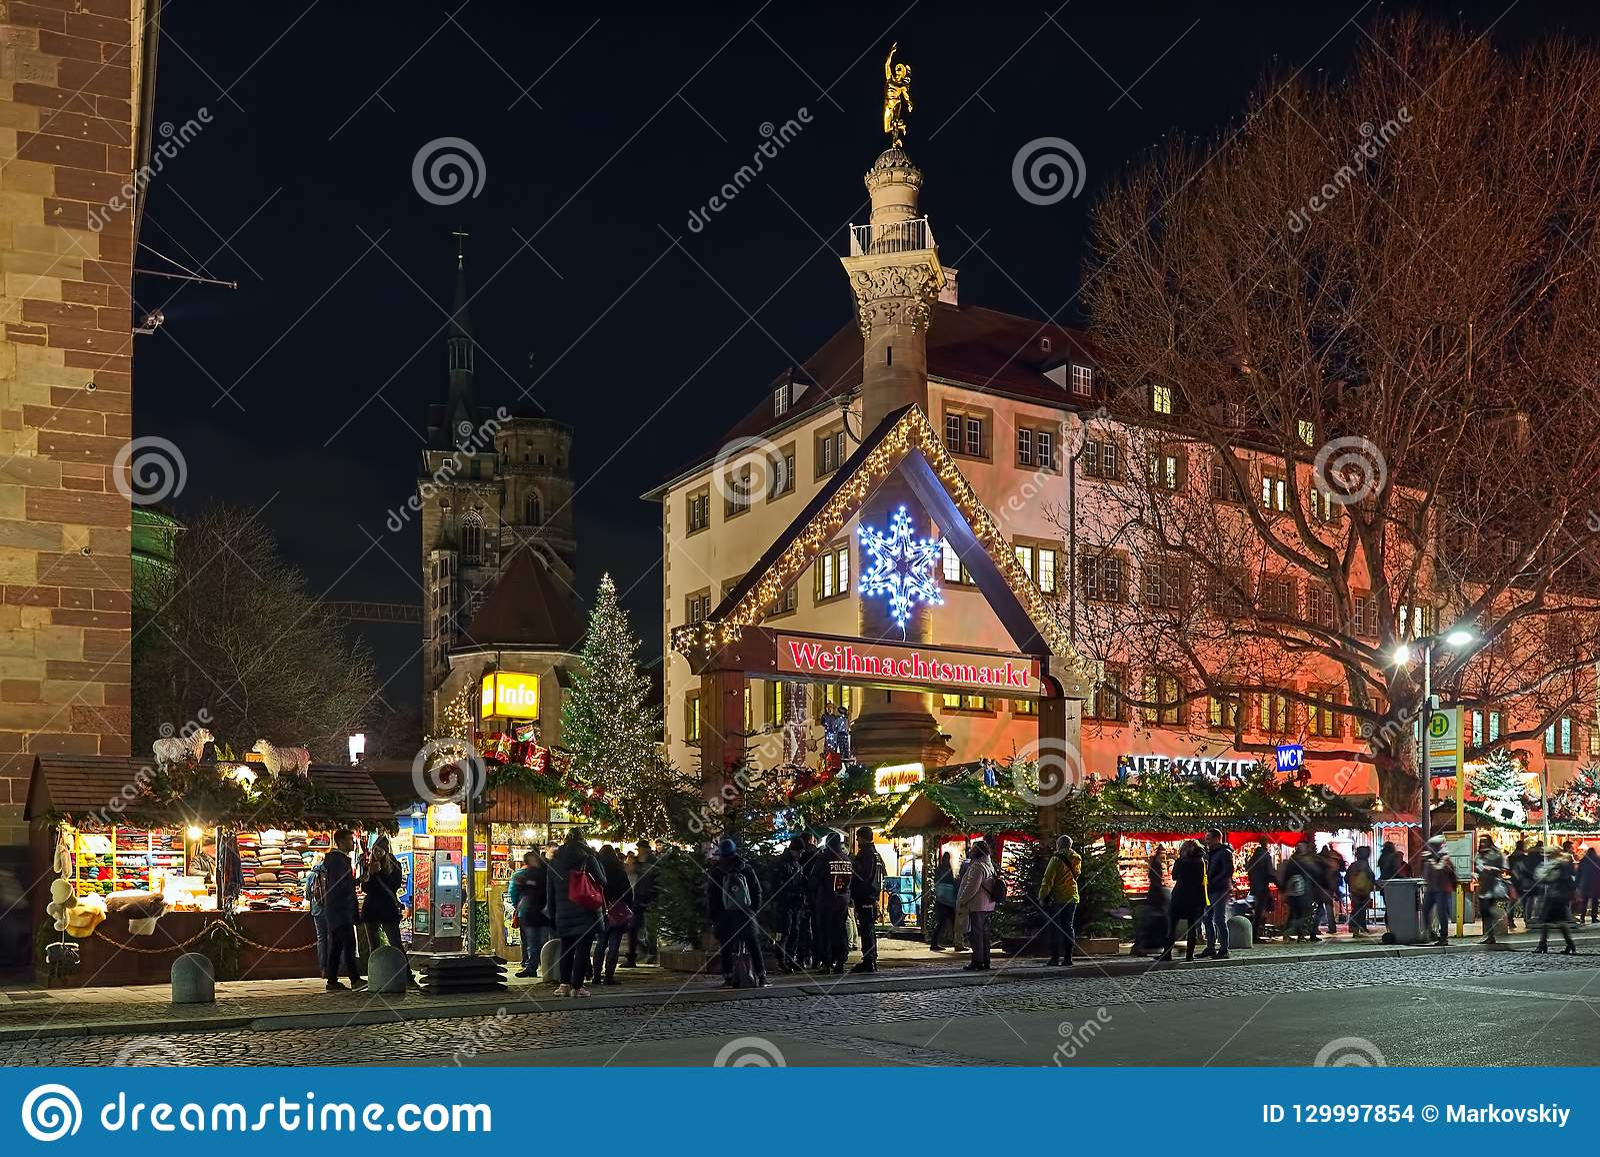 Christmas In Stuttgart Germany.Entrance To The Christmas Market At The Schillerplatz Square